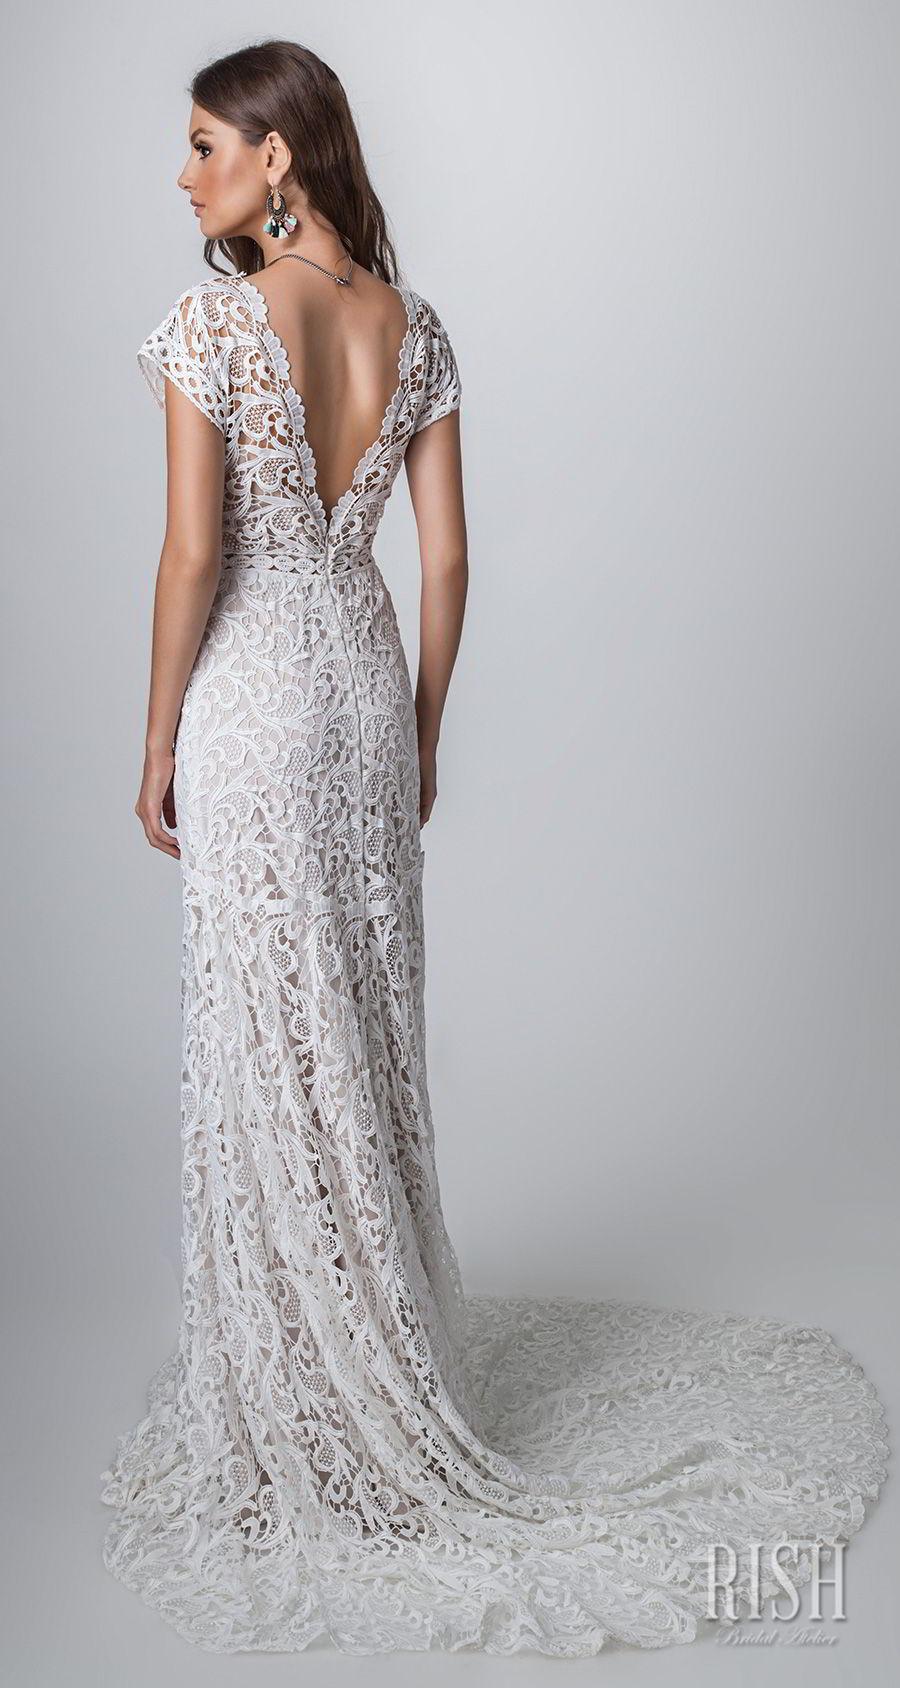 rish bridal sun dance 2018 cap sleeves v neck full embellishment romantic  bohemian modified a  line wedding dress v back short train (iris) bv